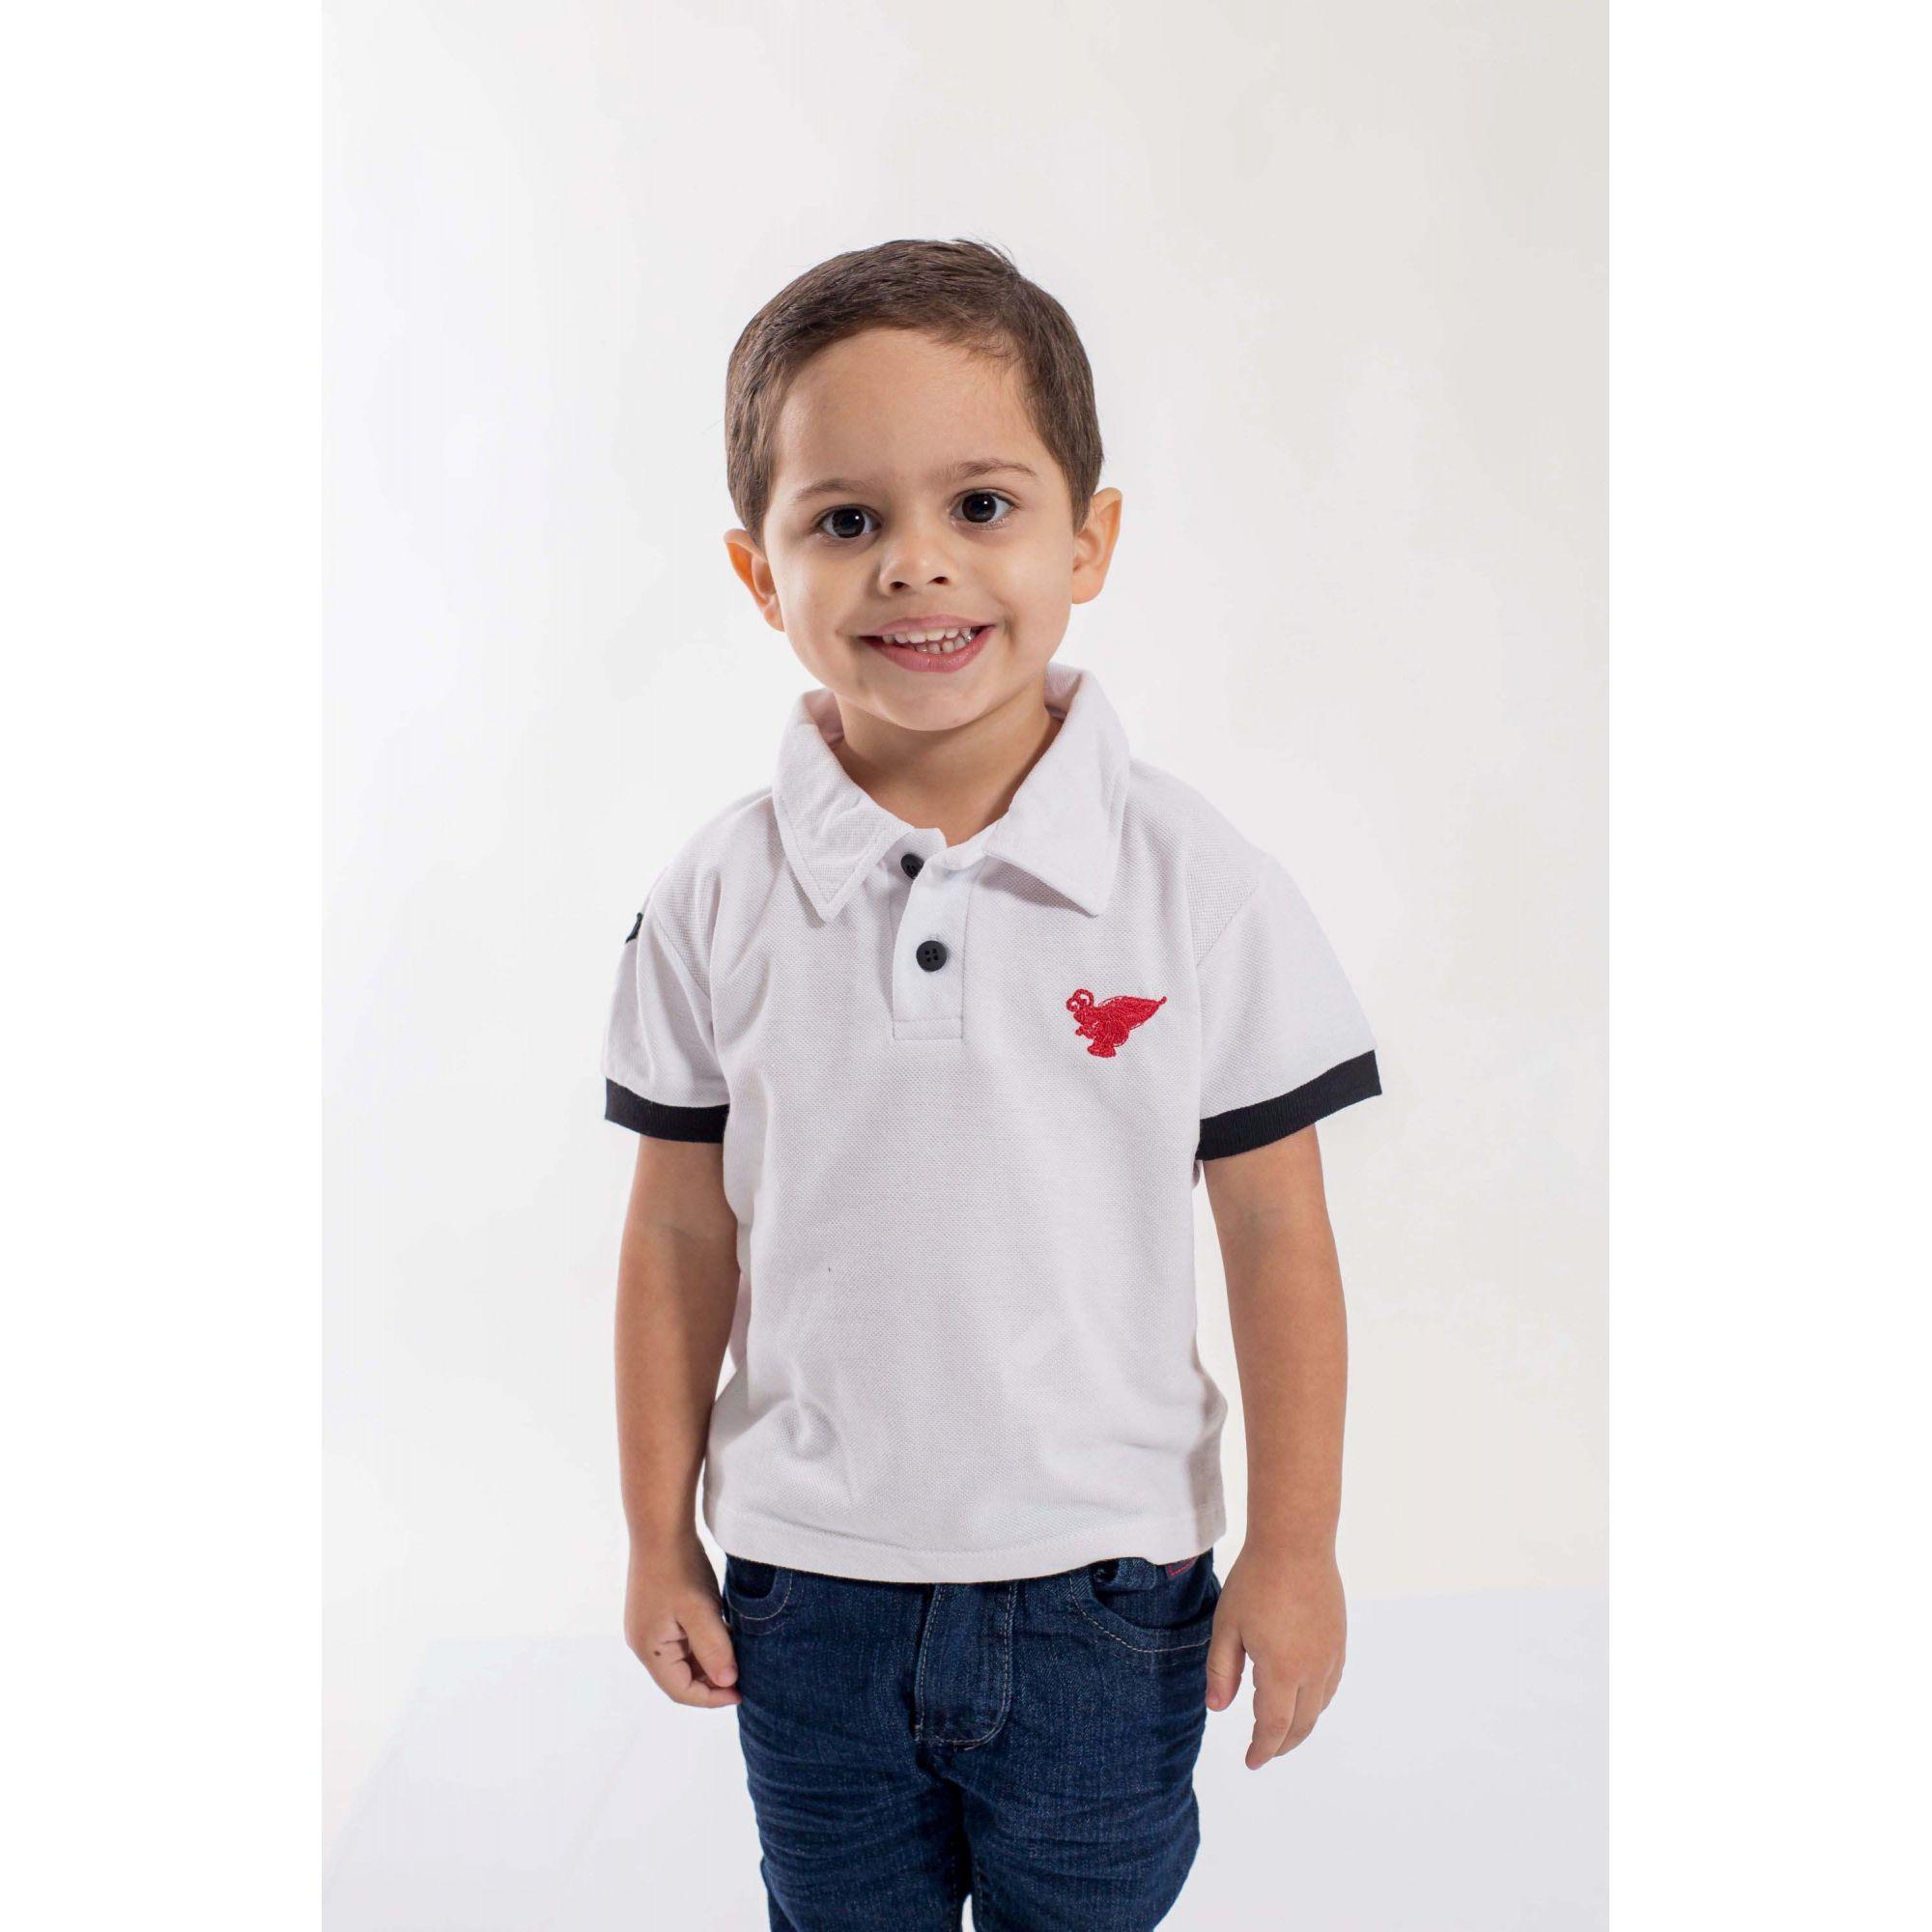 Camisa Polo Infantil Branco com Preto  - Heitor Fashion Brazil